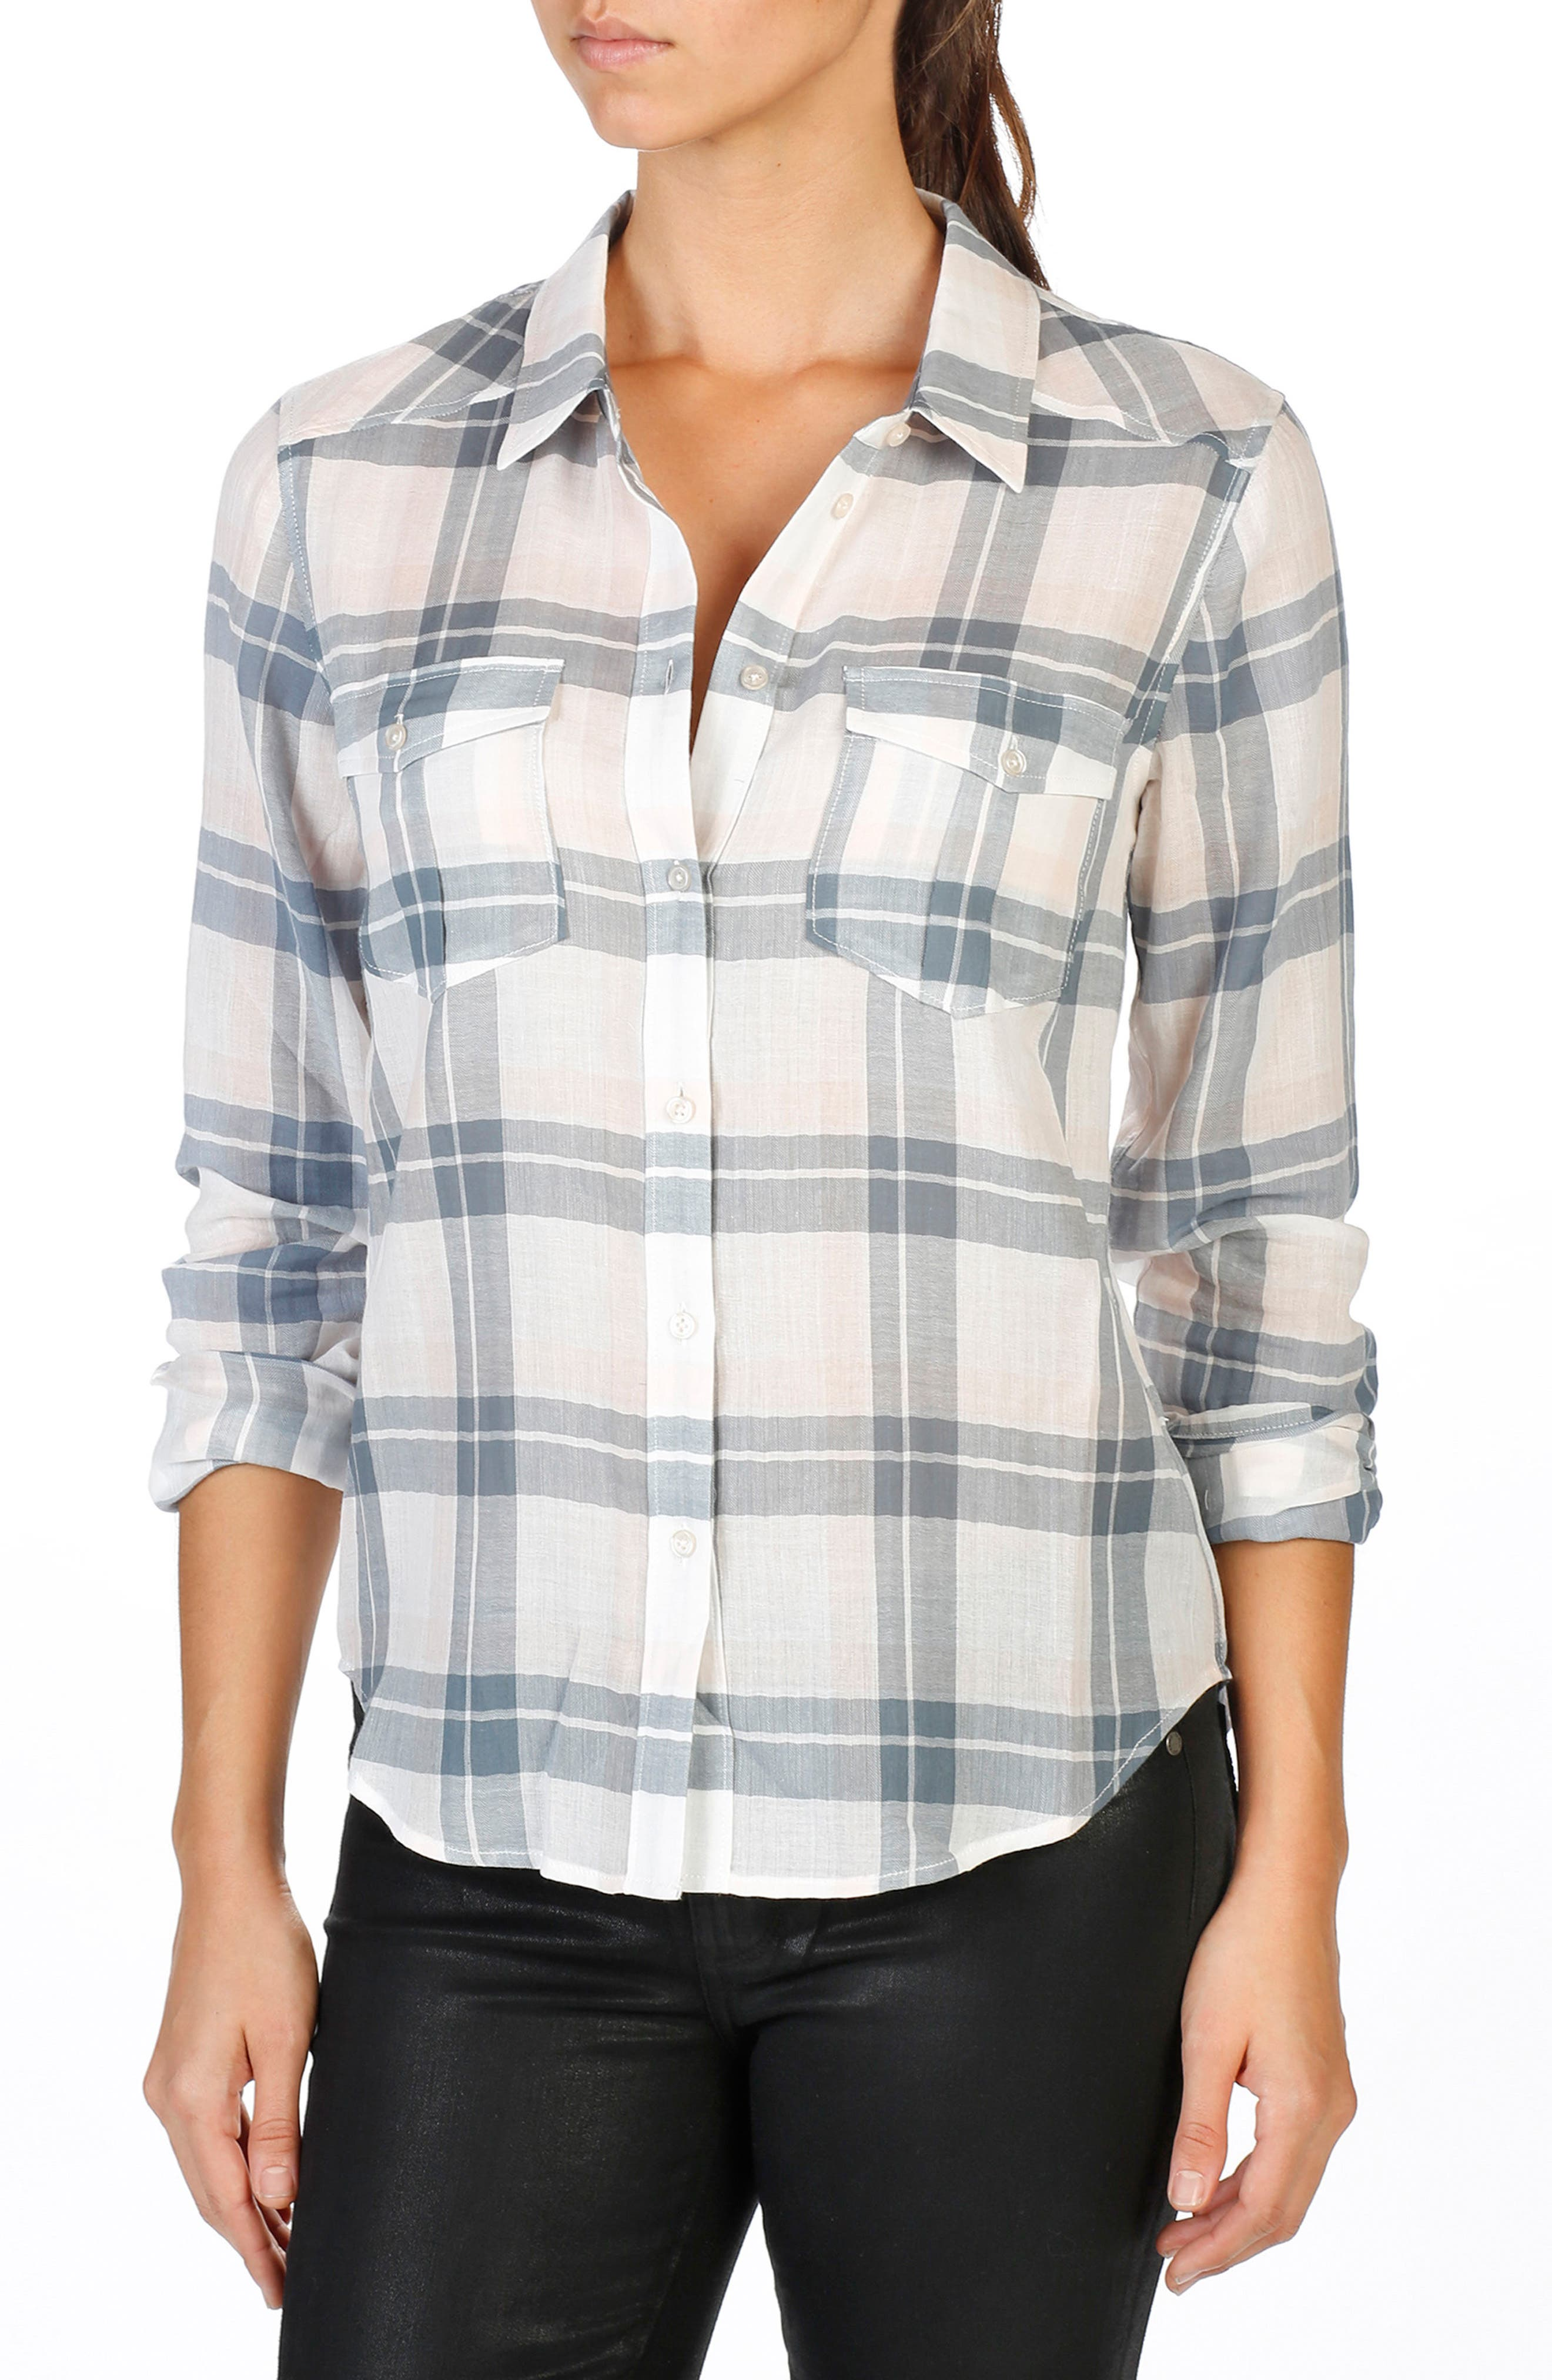 Mya Plaid Shirt,                             Main thumbnail 1, color,                             100